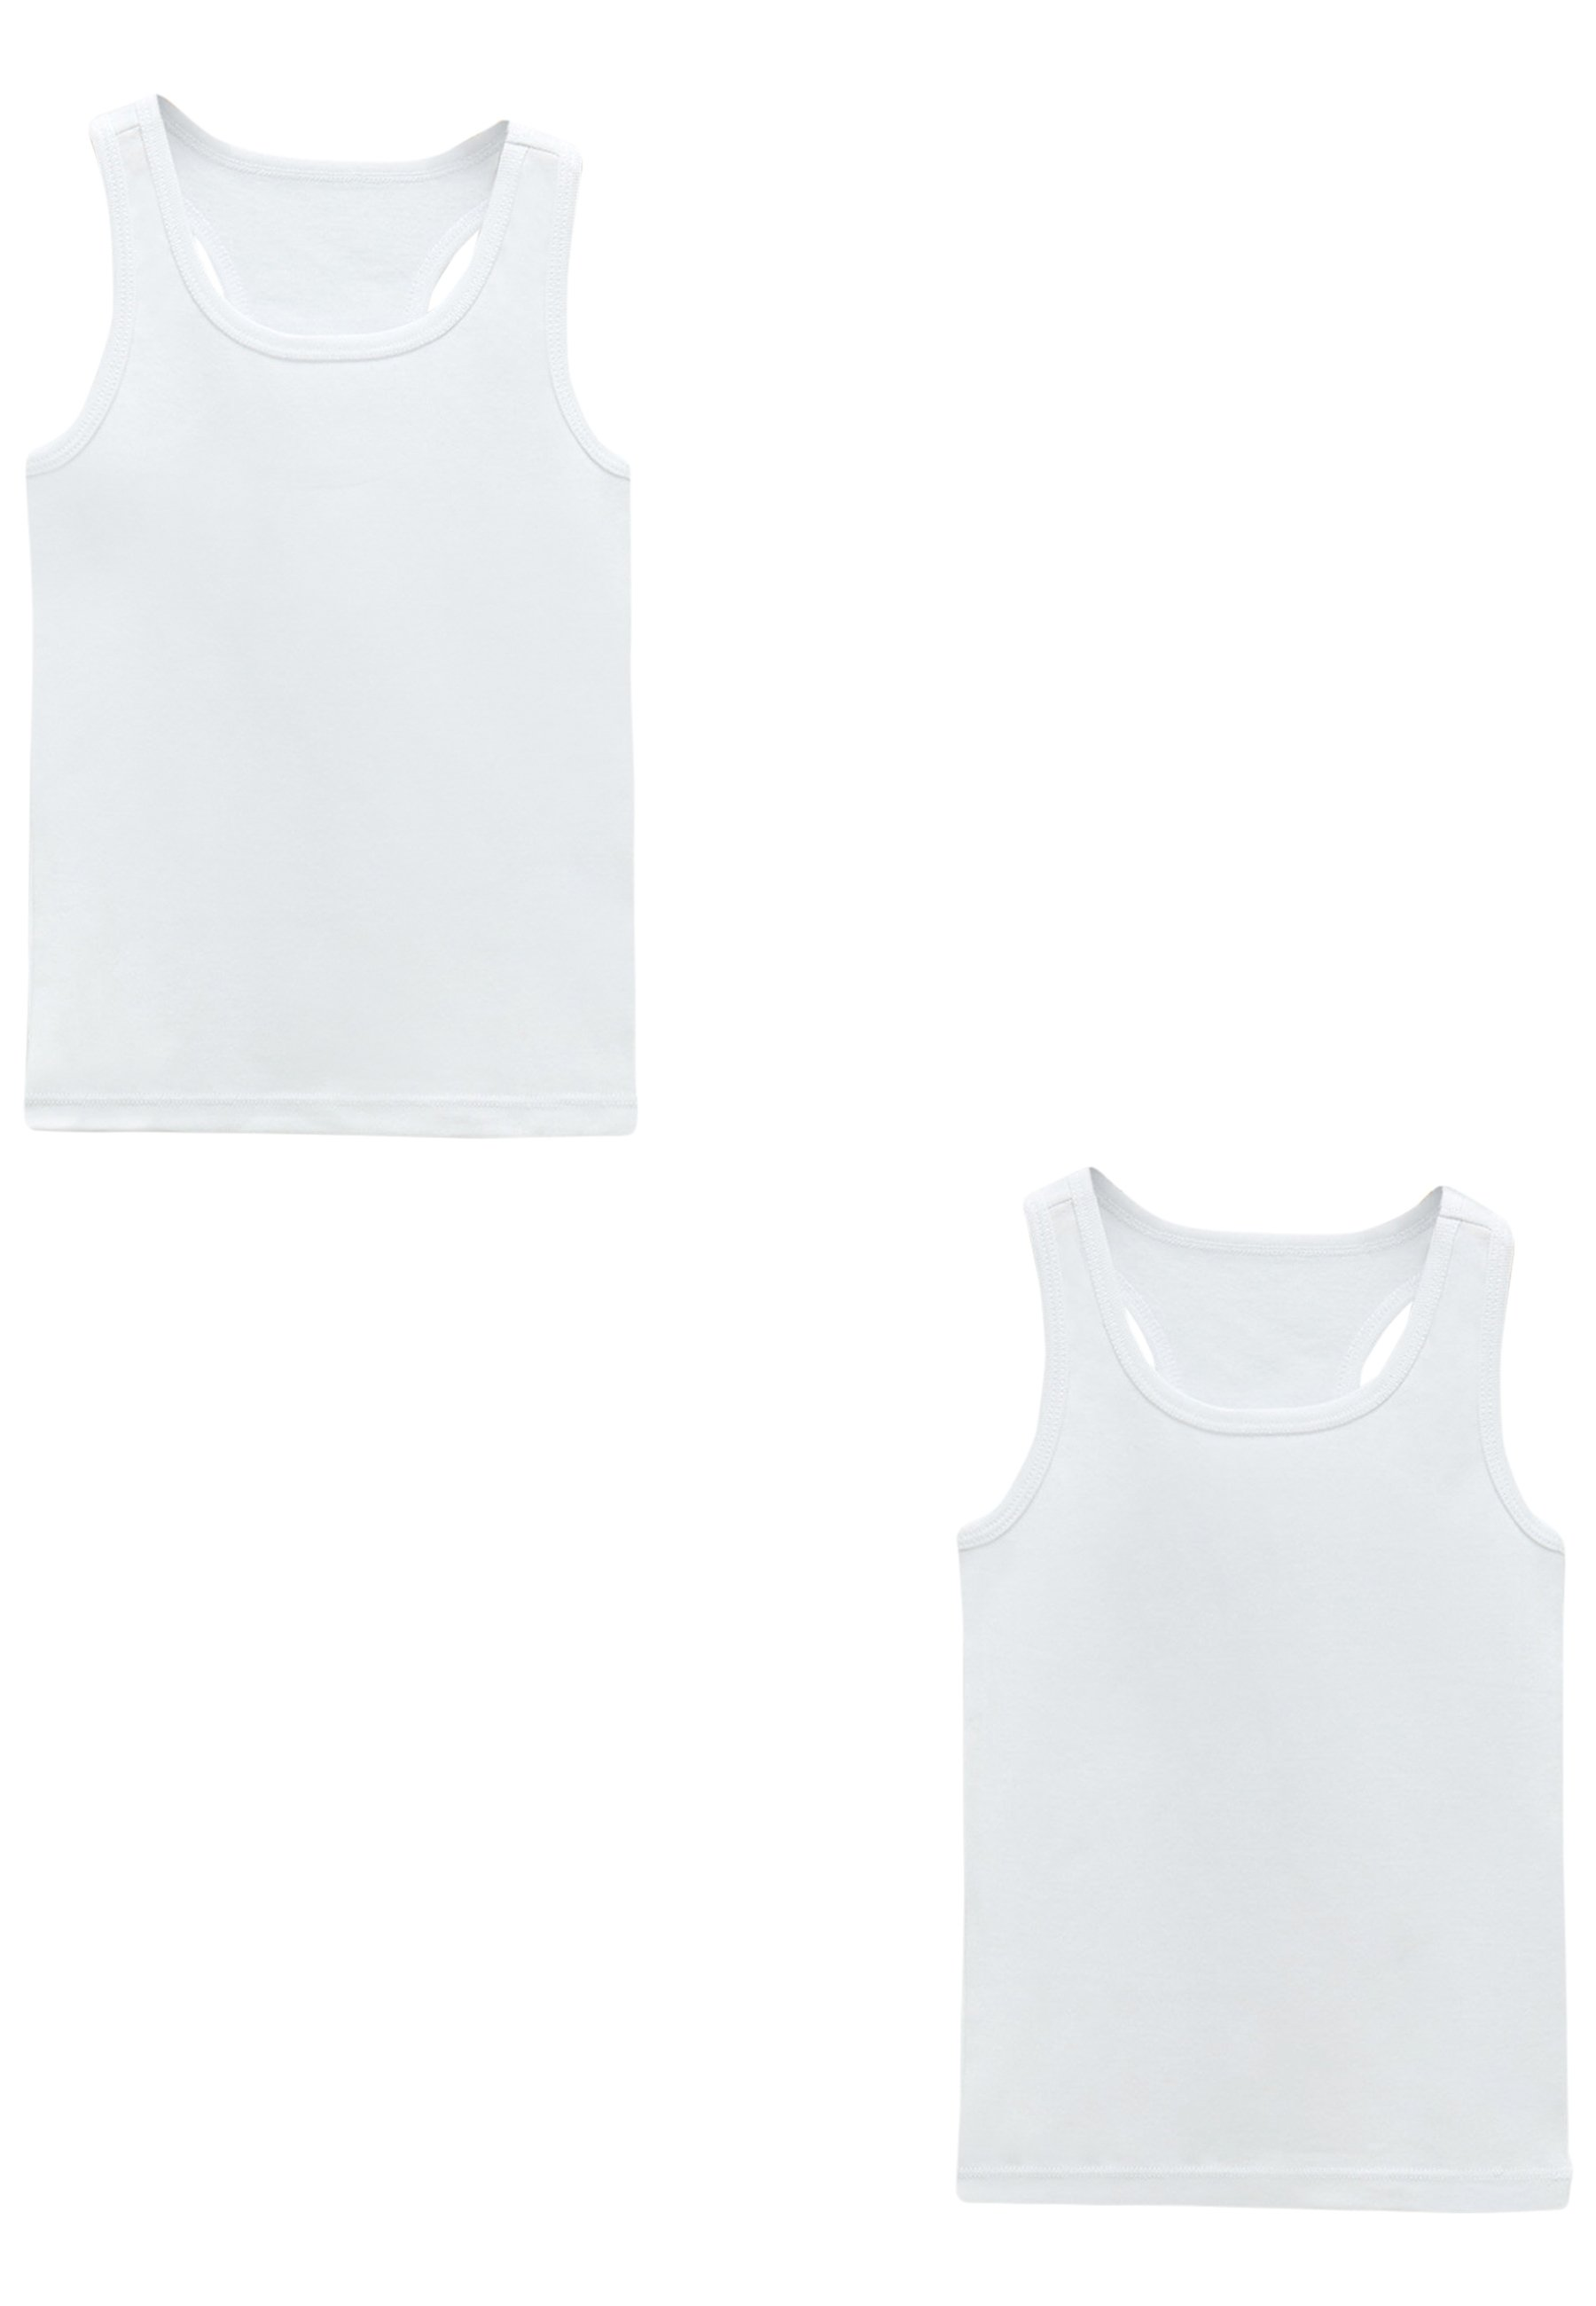 Kinder 2 PACK - Unterhemd/-shirt